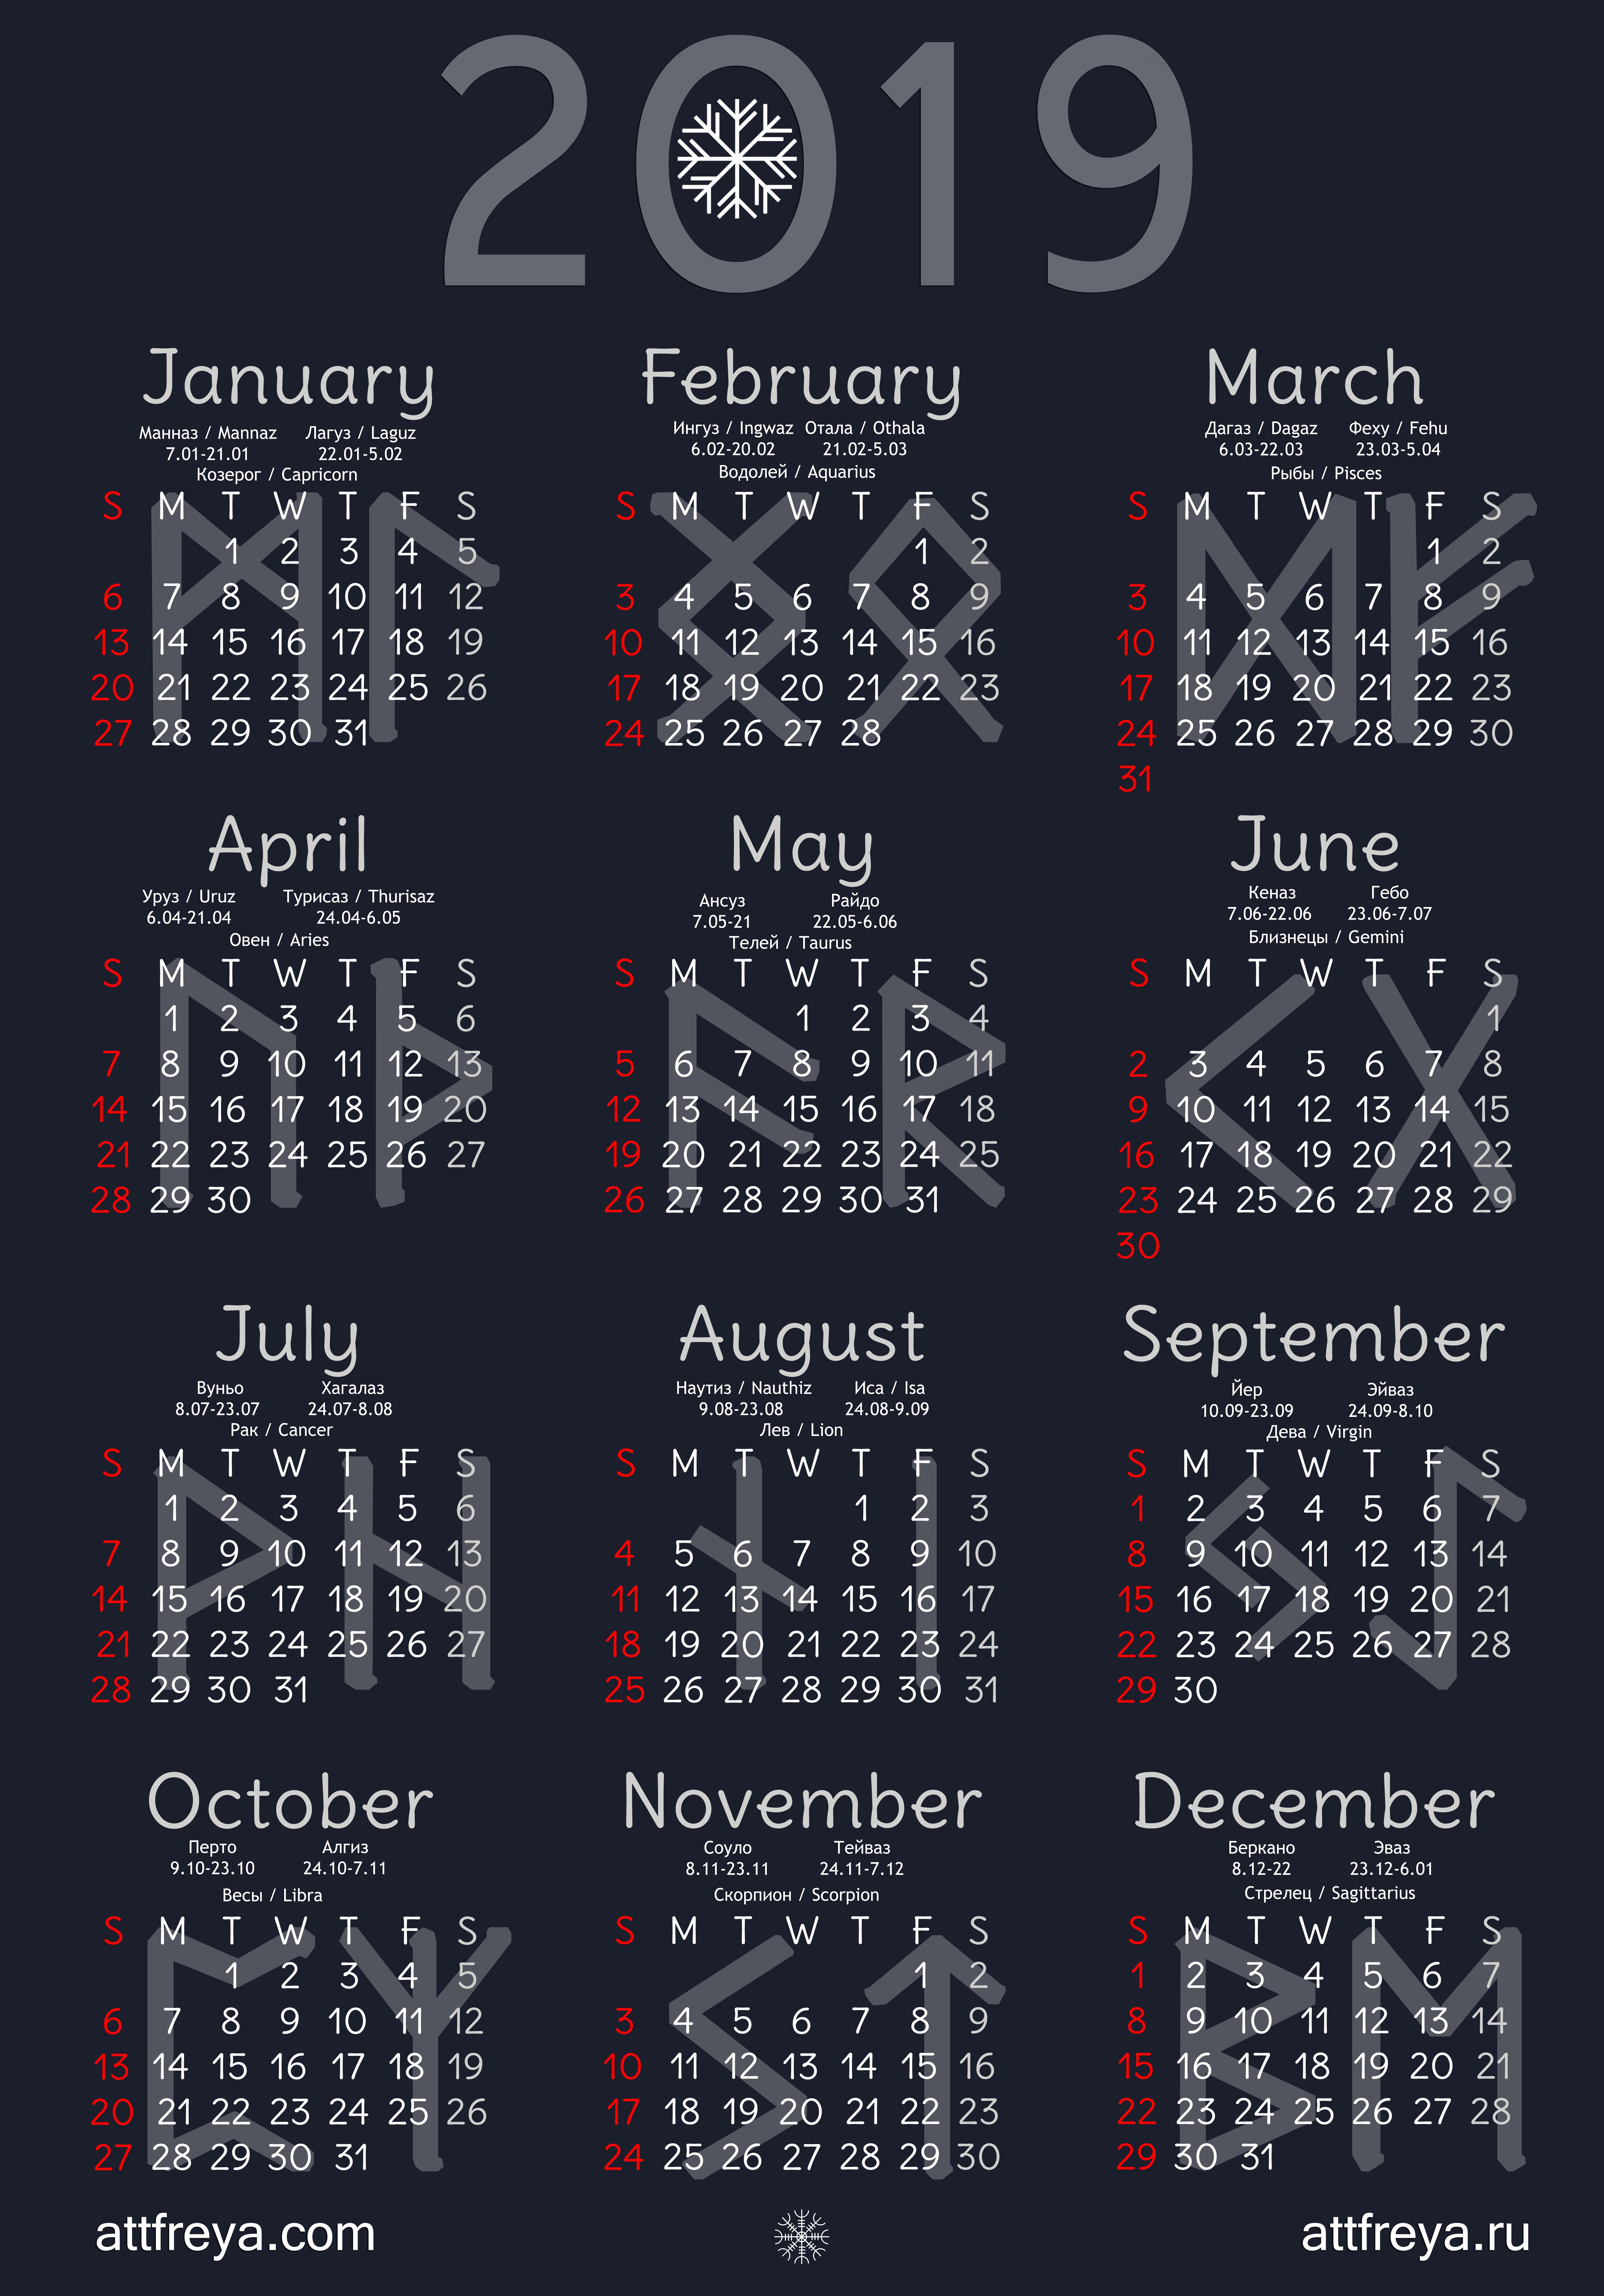 ᚨᚱᚾ :: 9-7-2019 :: Runic Calendar 2019. Futhark Runes And